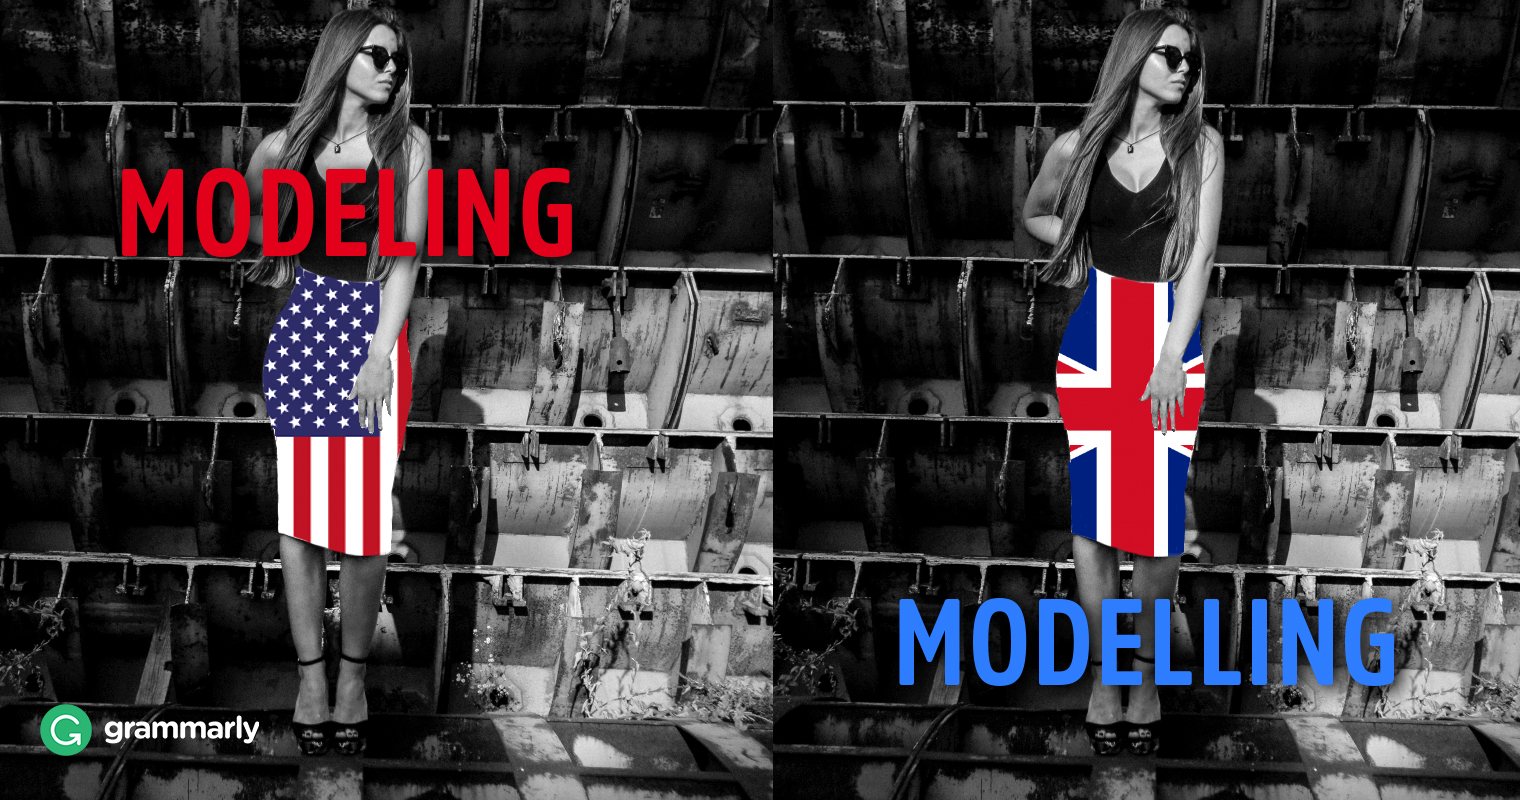 modeling vs modelling grammarly blog